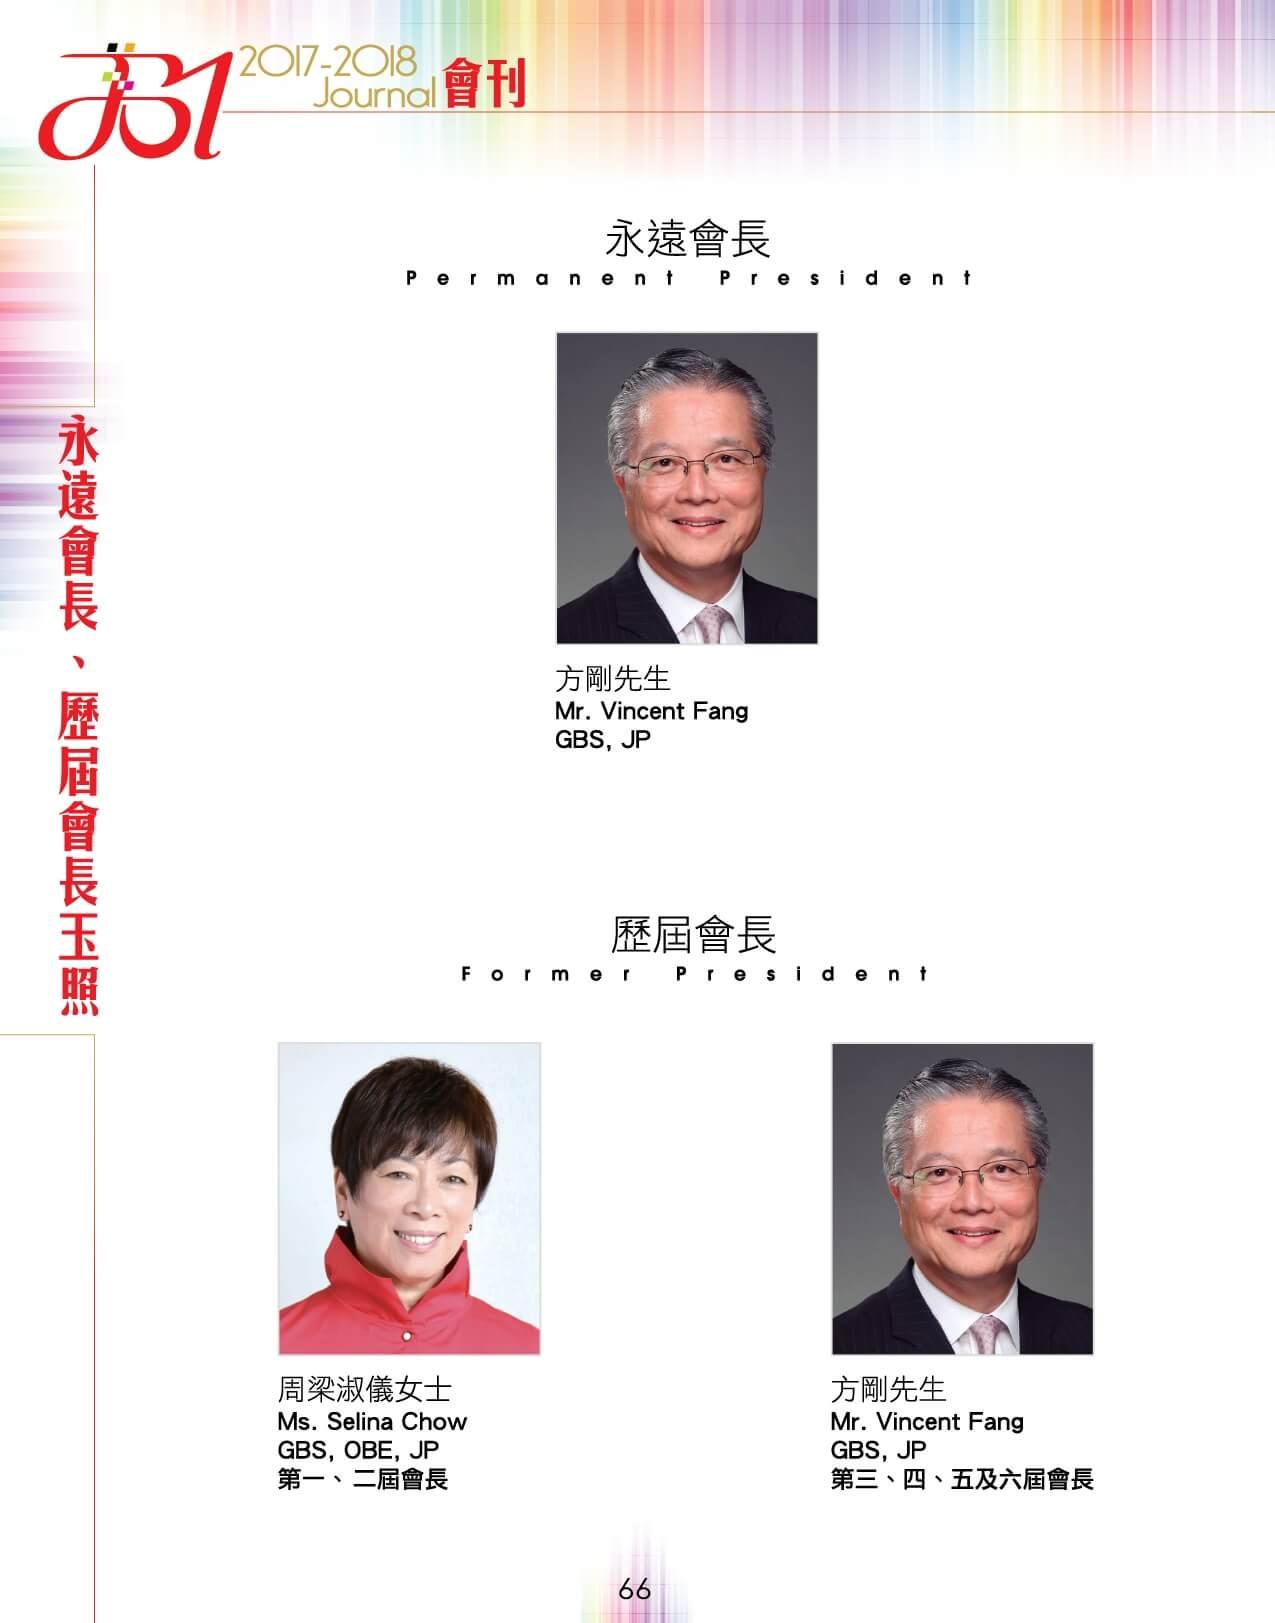 P066-2017-2018-FBi-Chairman-OP